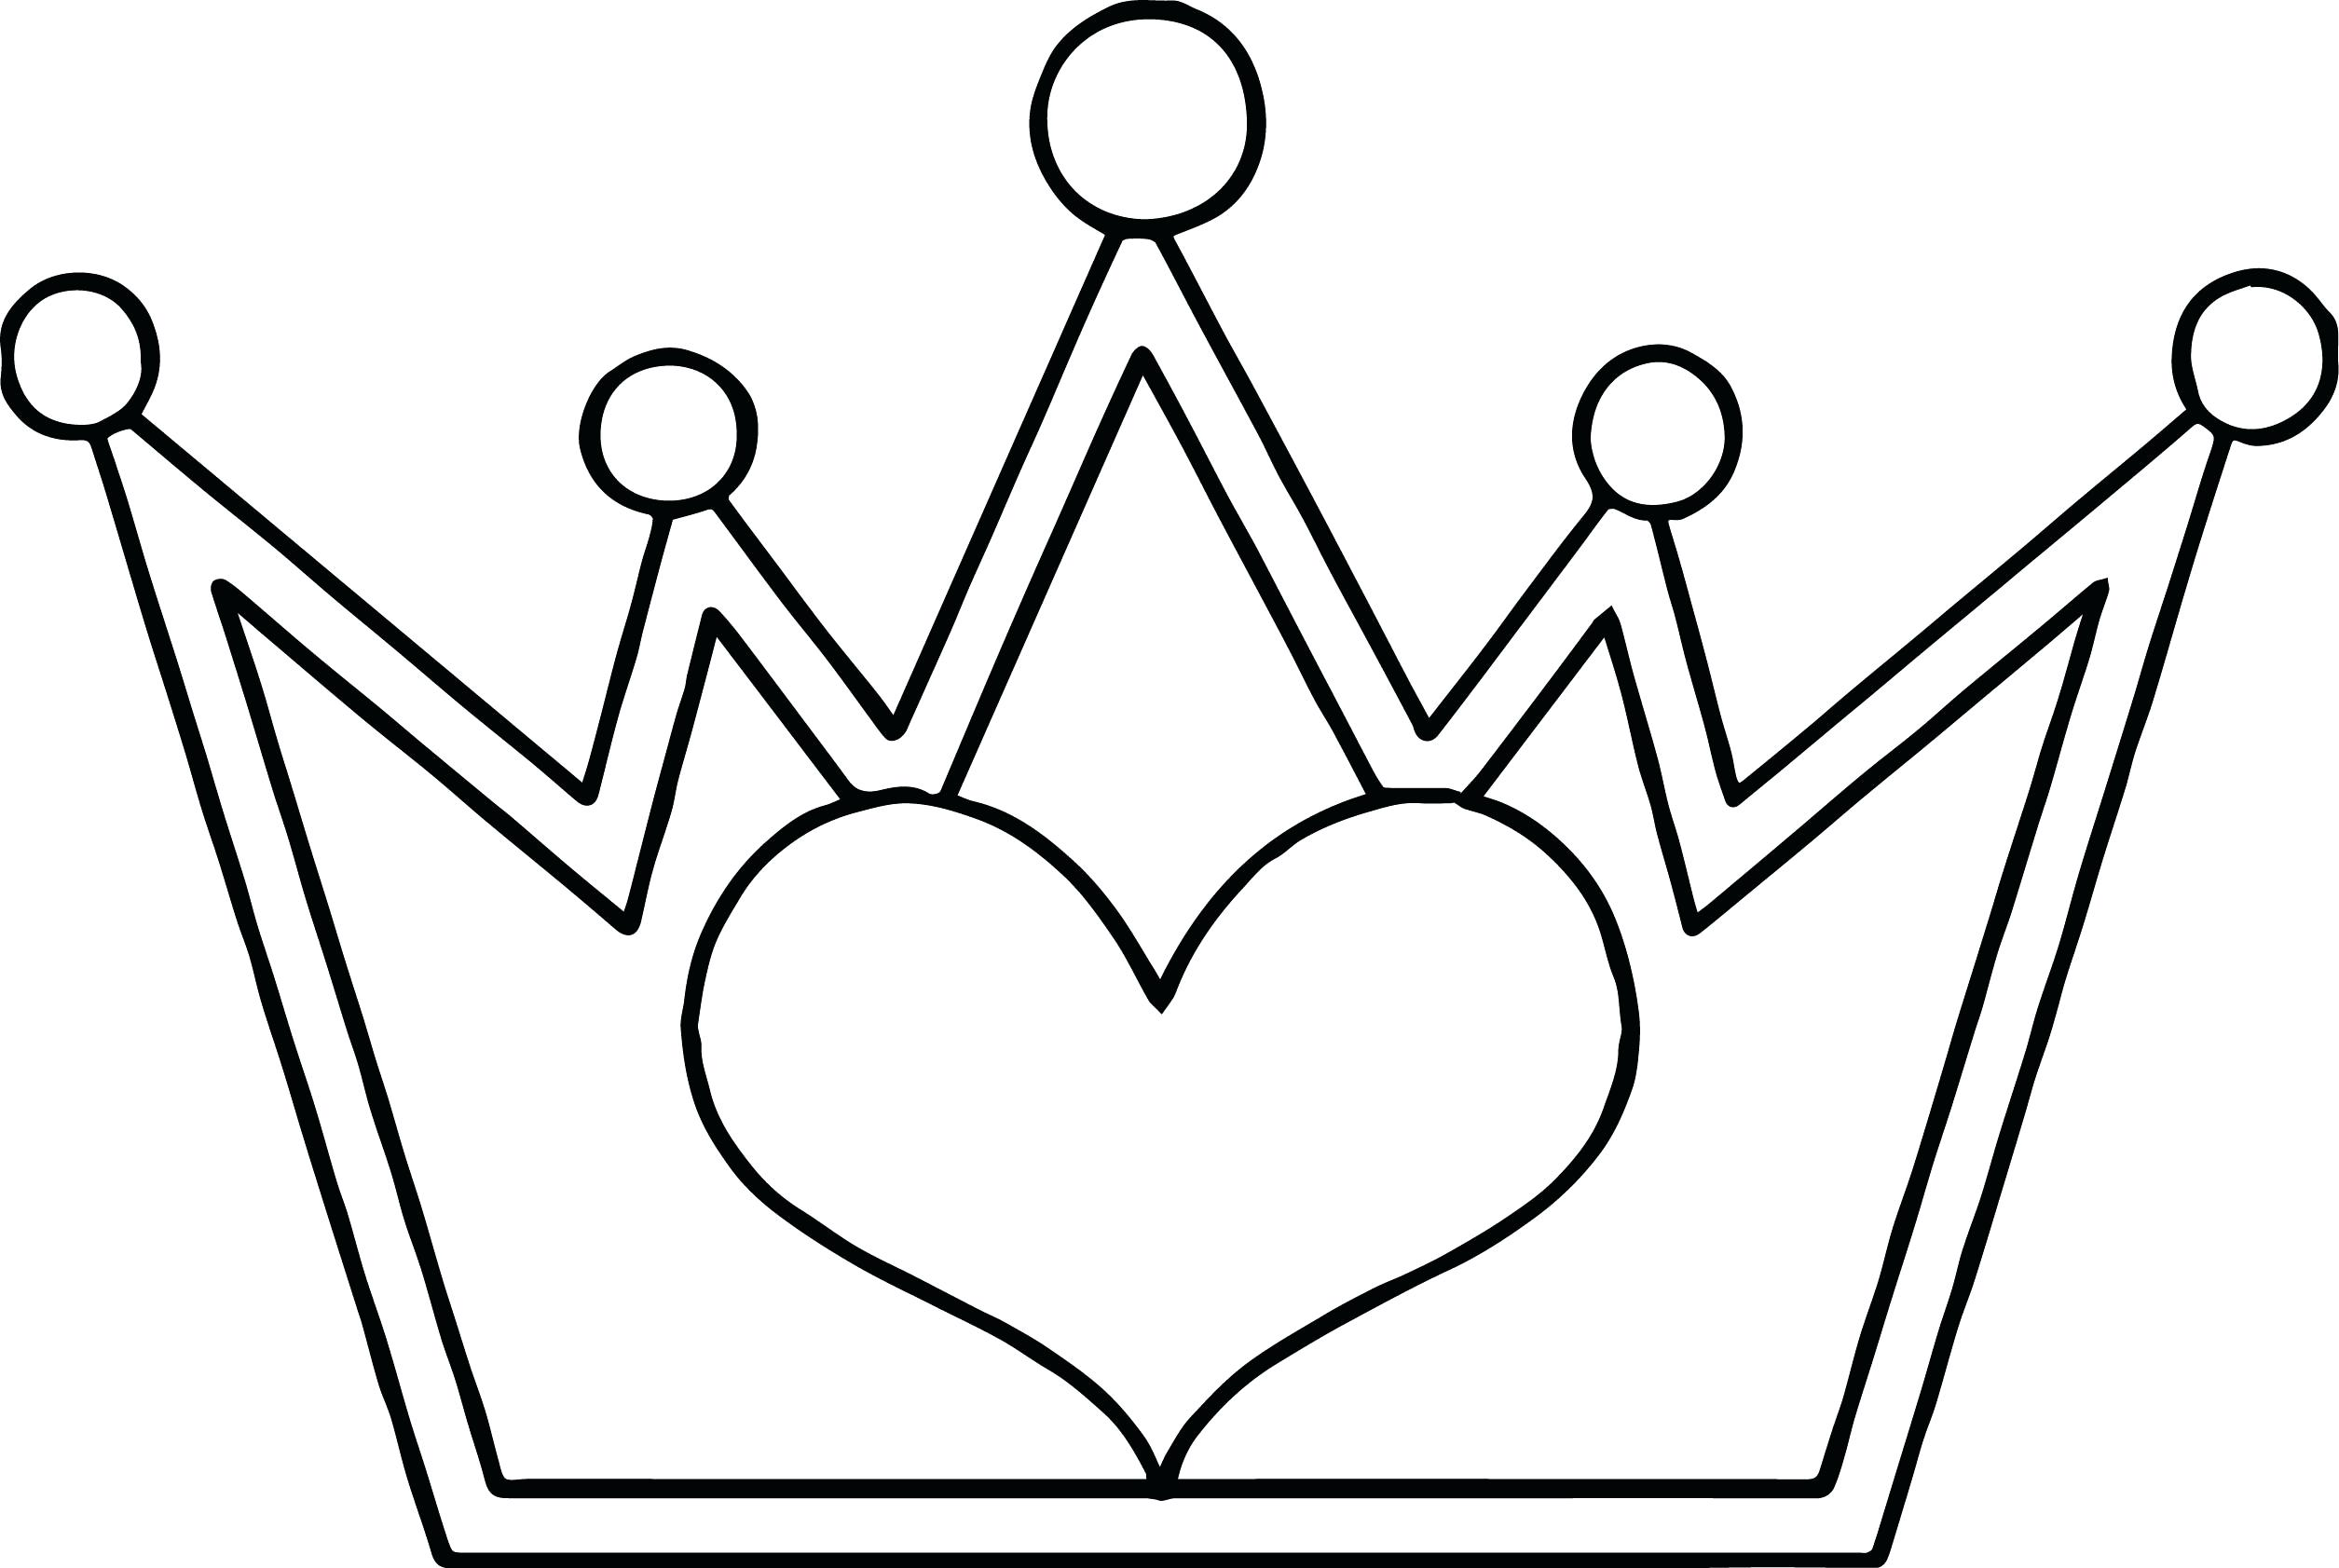 crown drawing template at getdrawings com